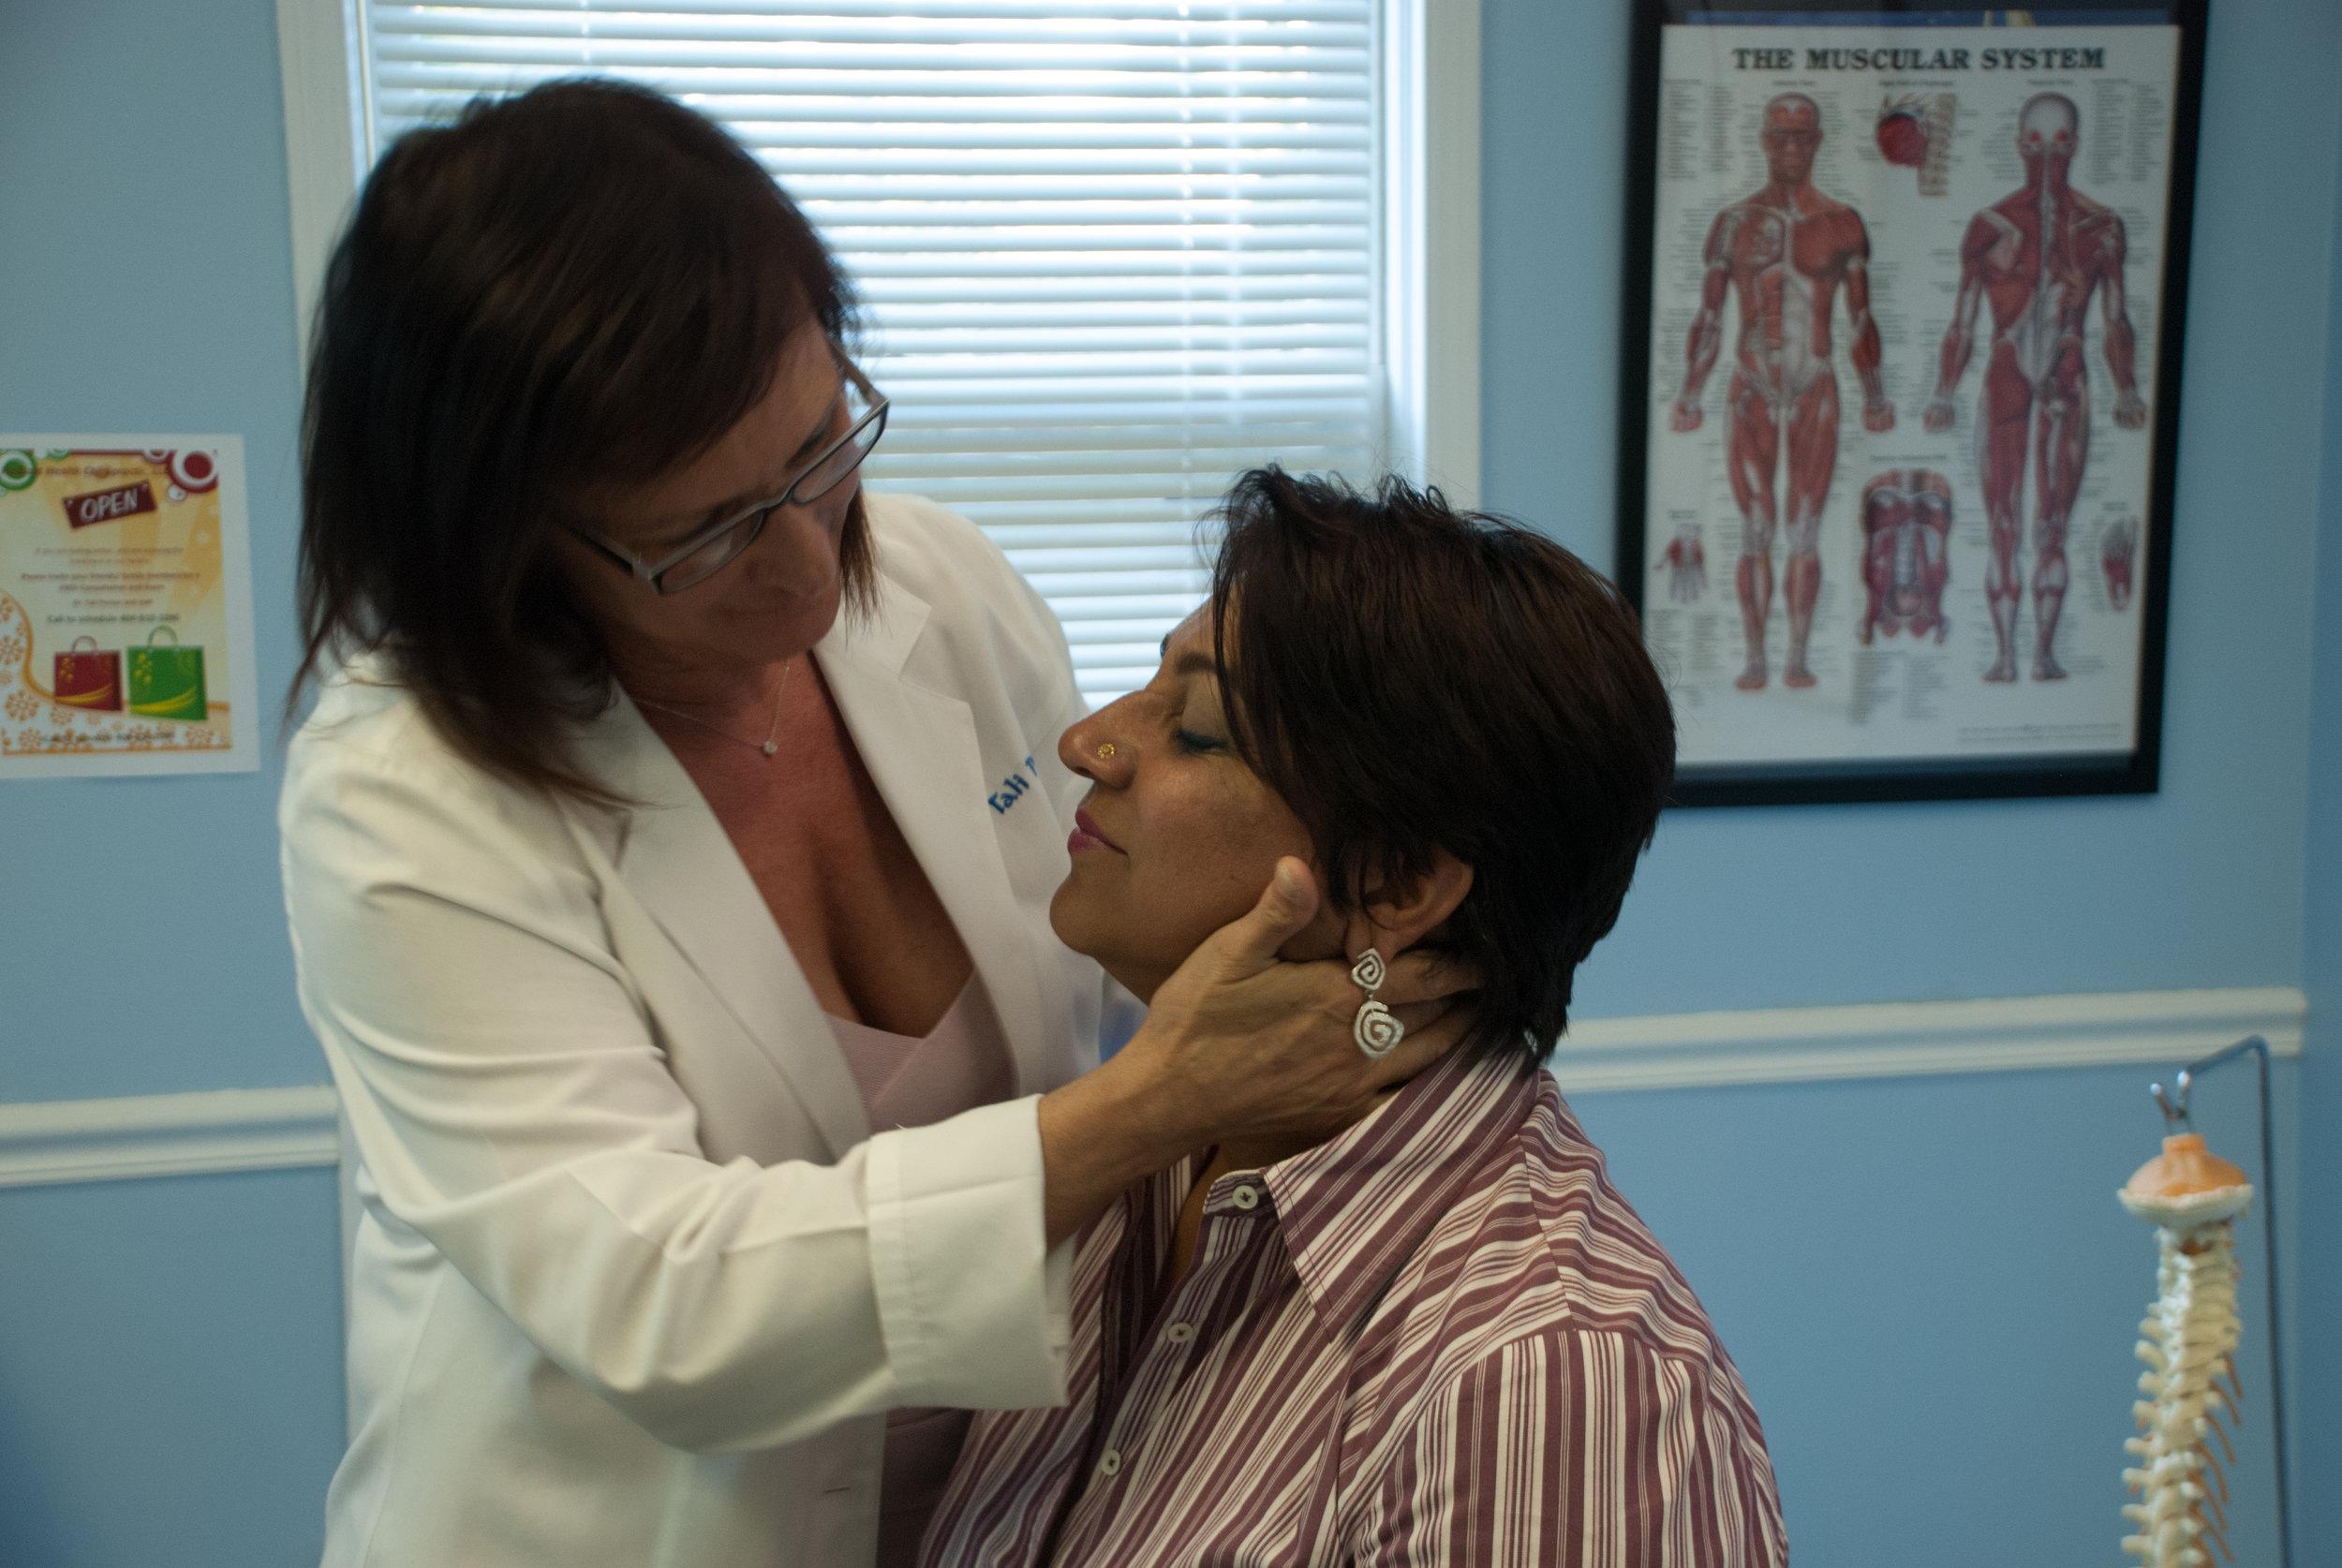 Sciatica and neck pain treatment - Smyrna Chiropractor